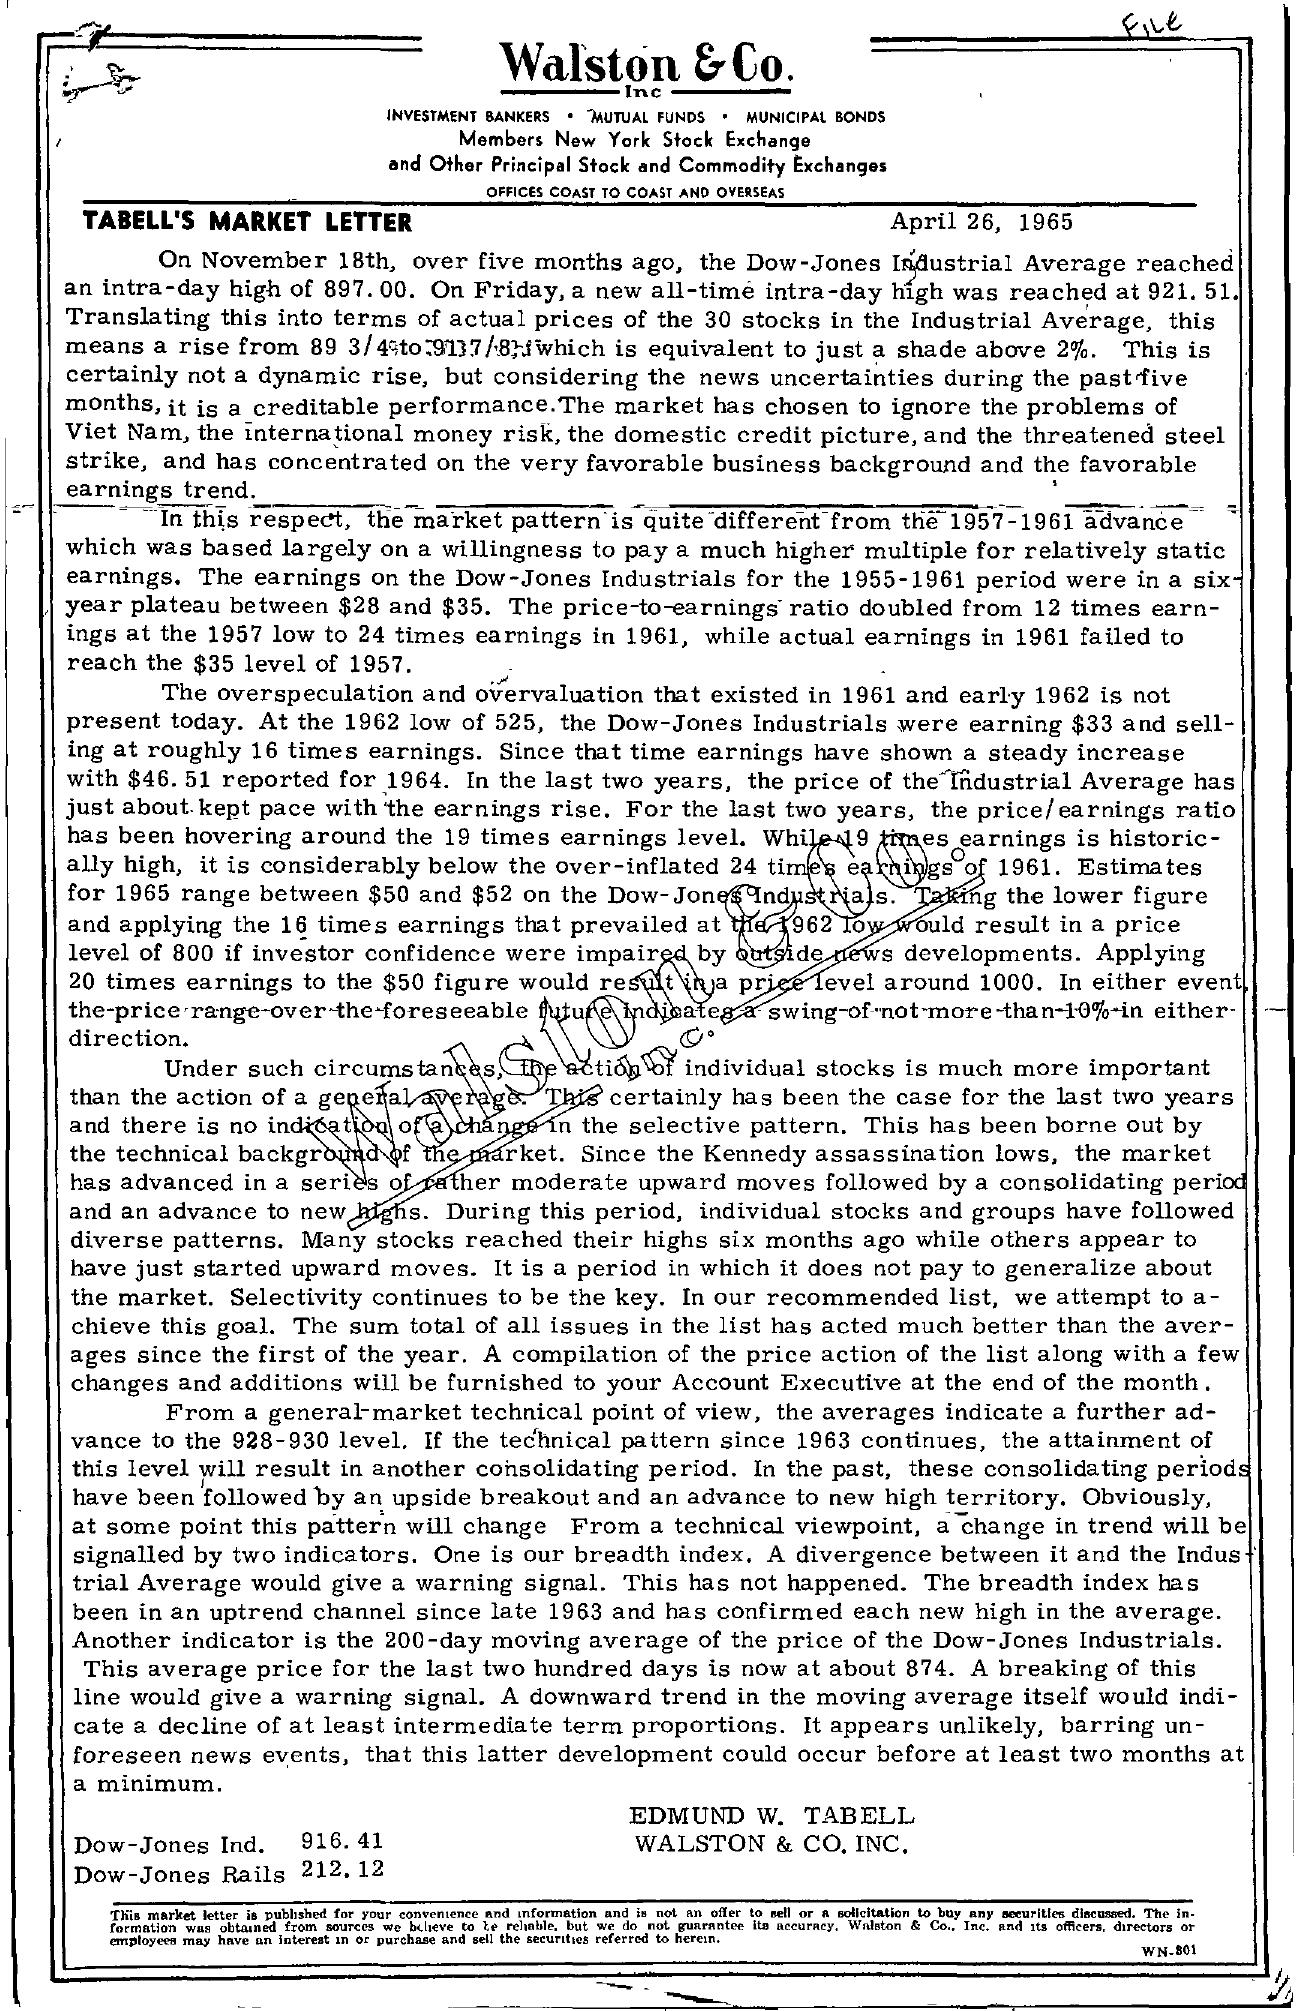 Tabell's Market Letter - April 26, 1965